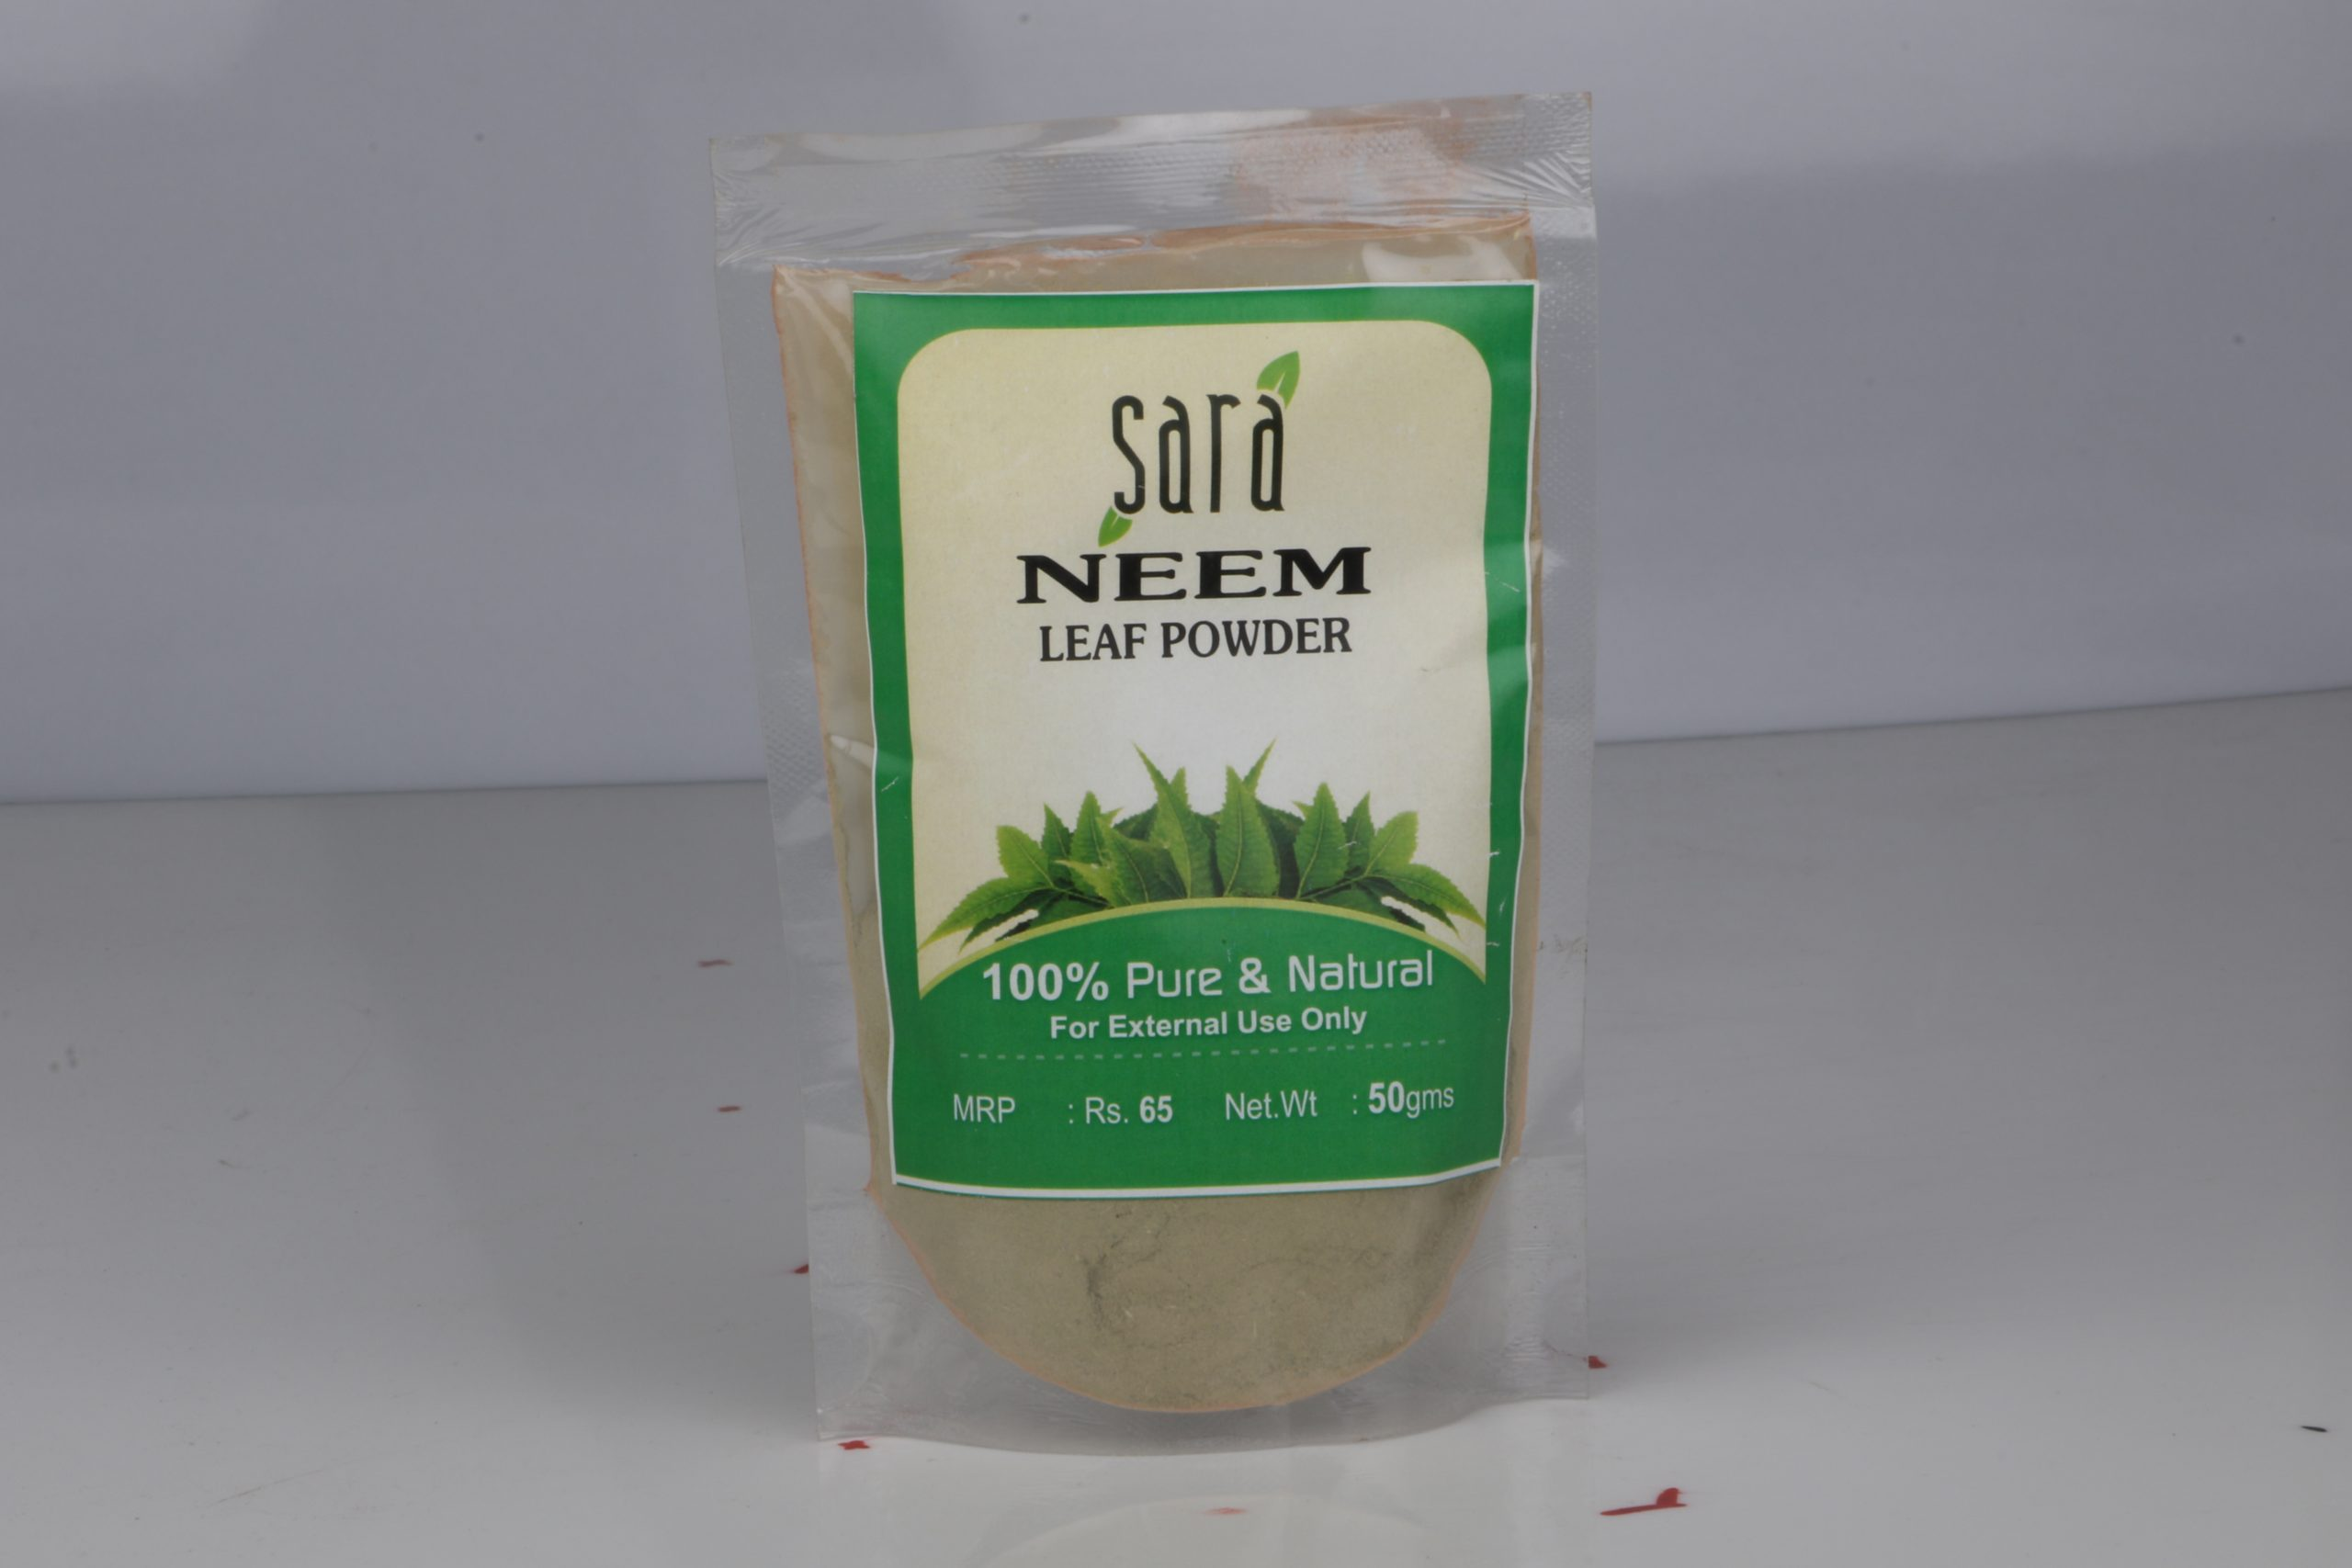 SARA NEEM LEAF POWDER 50GM